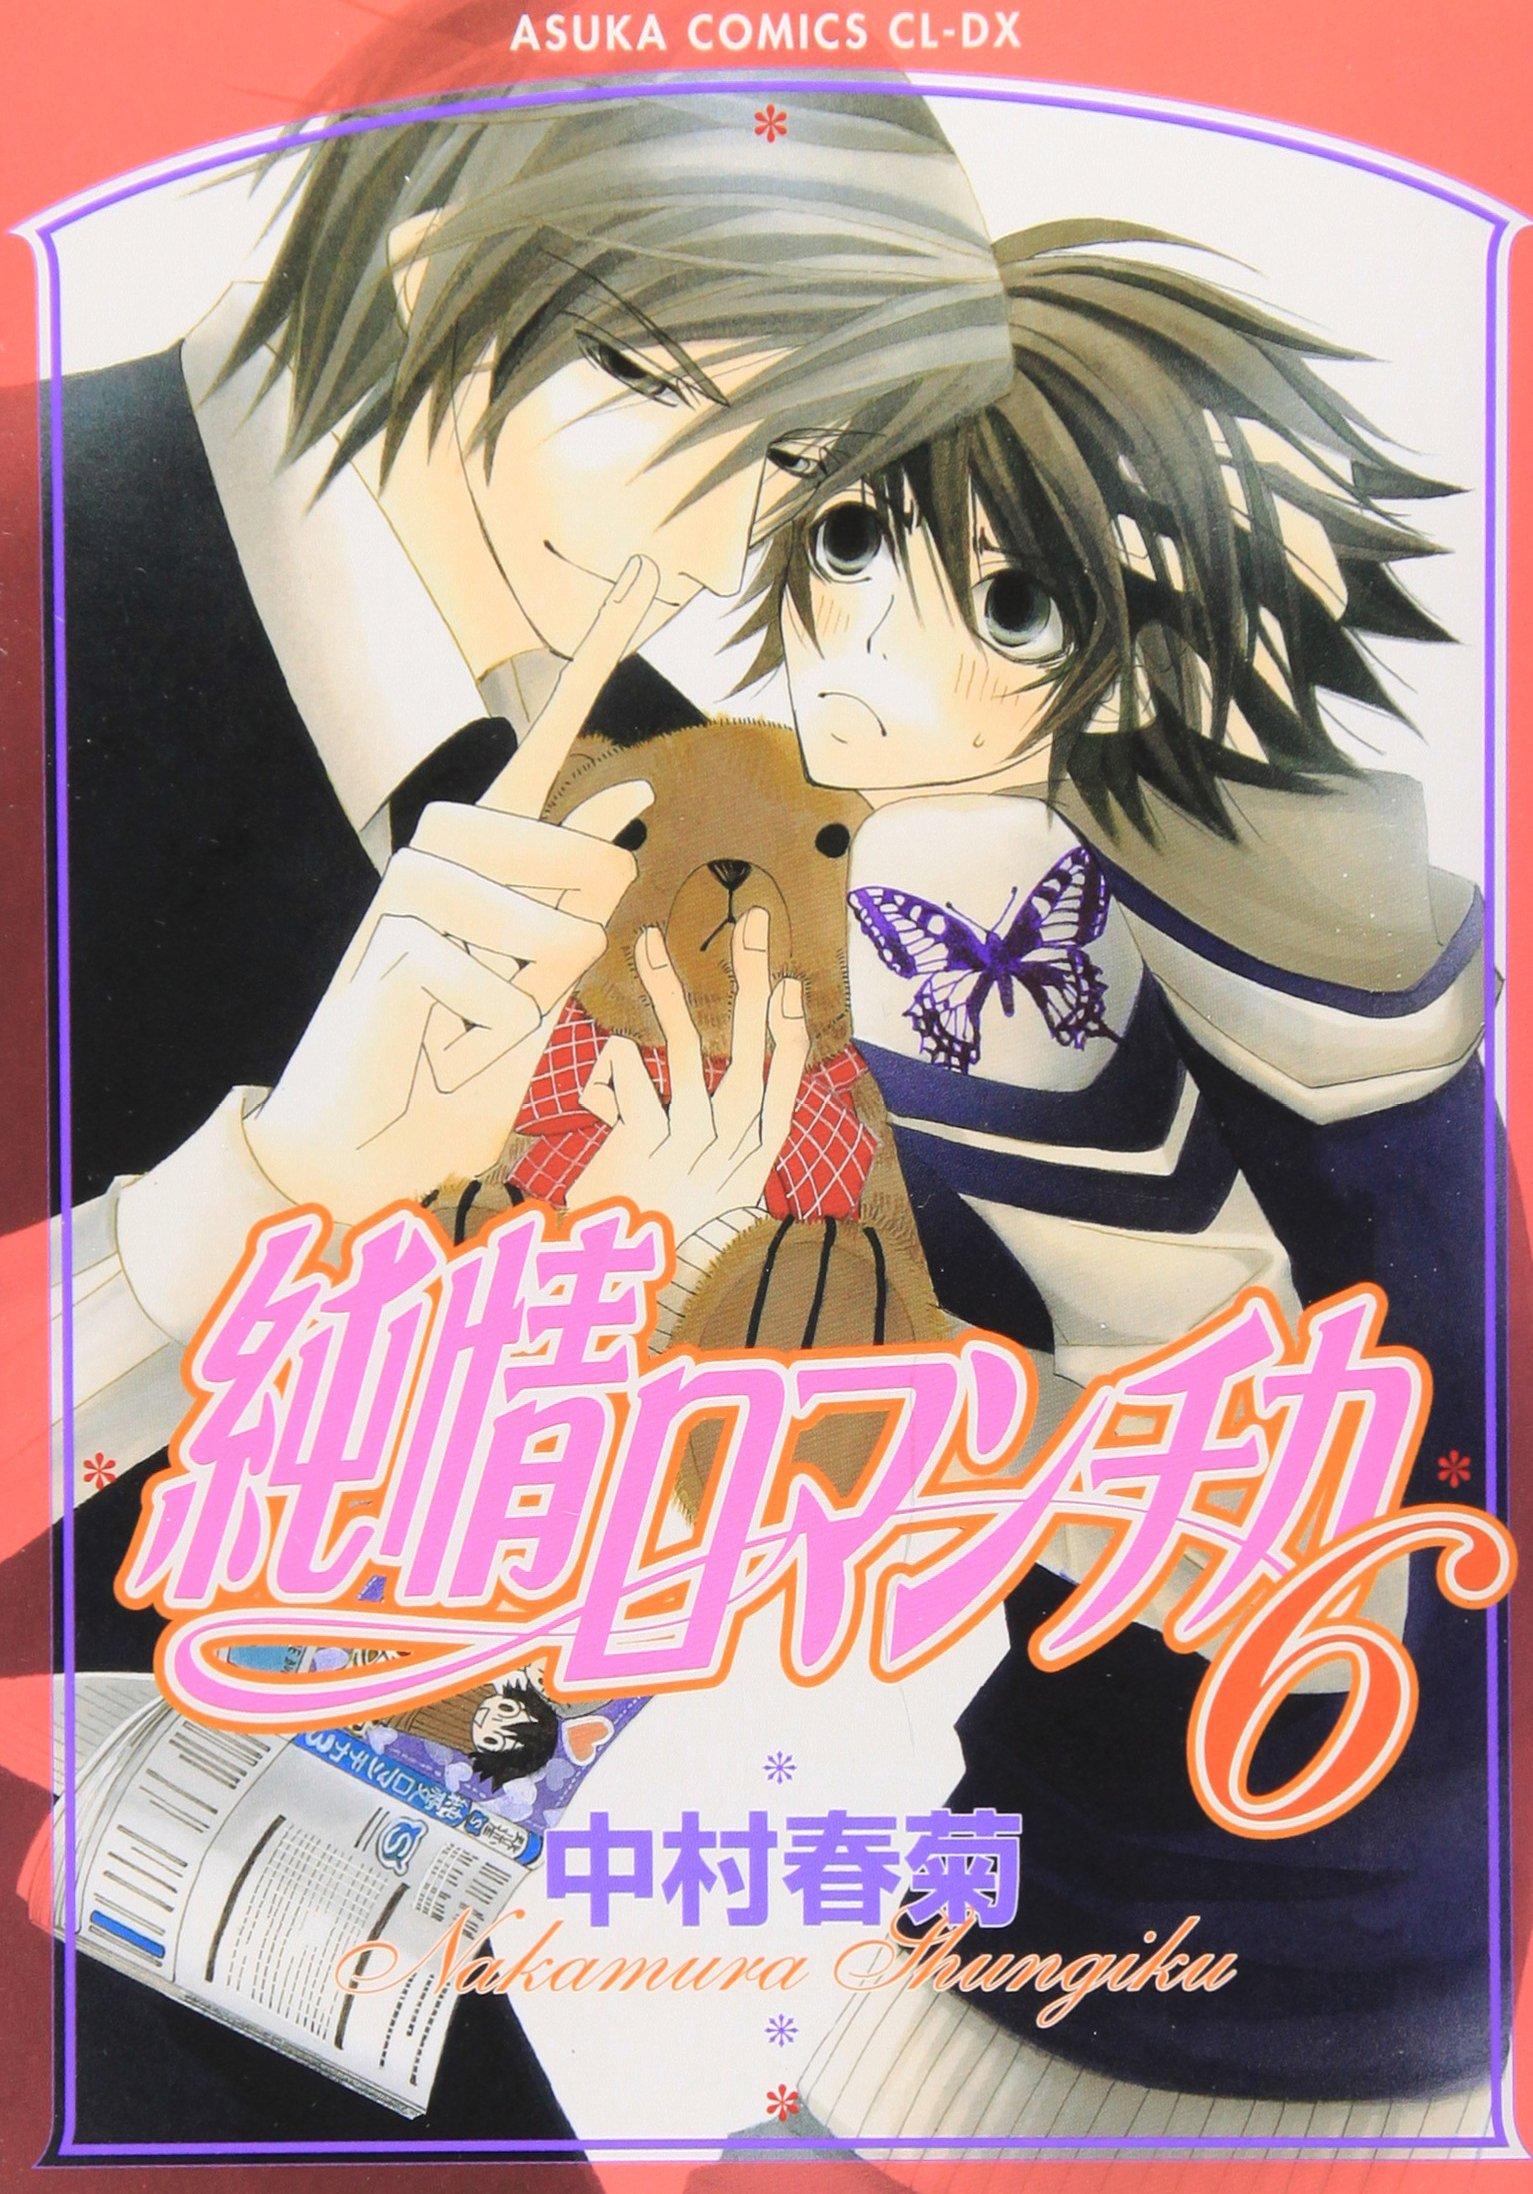 Read Online Junjou Romantica Vol.6 [Japanese Edition] pdf epub